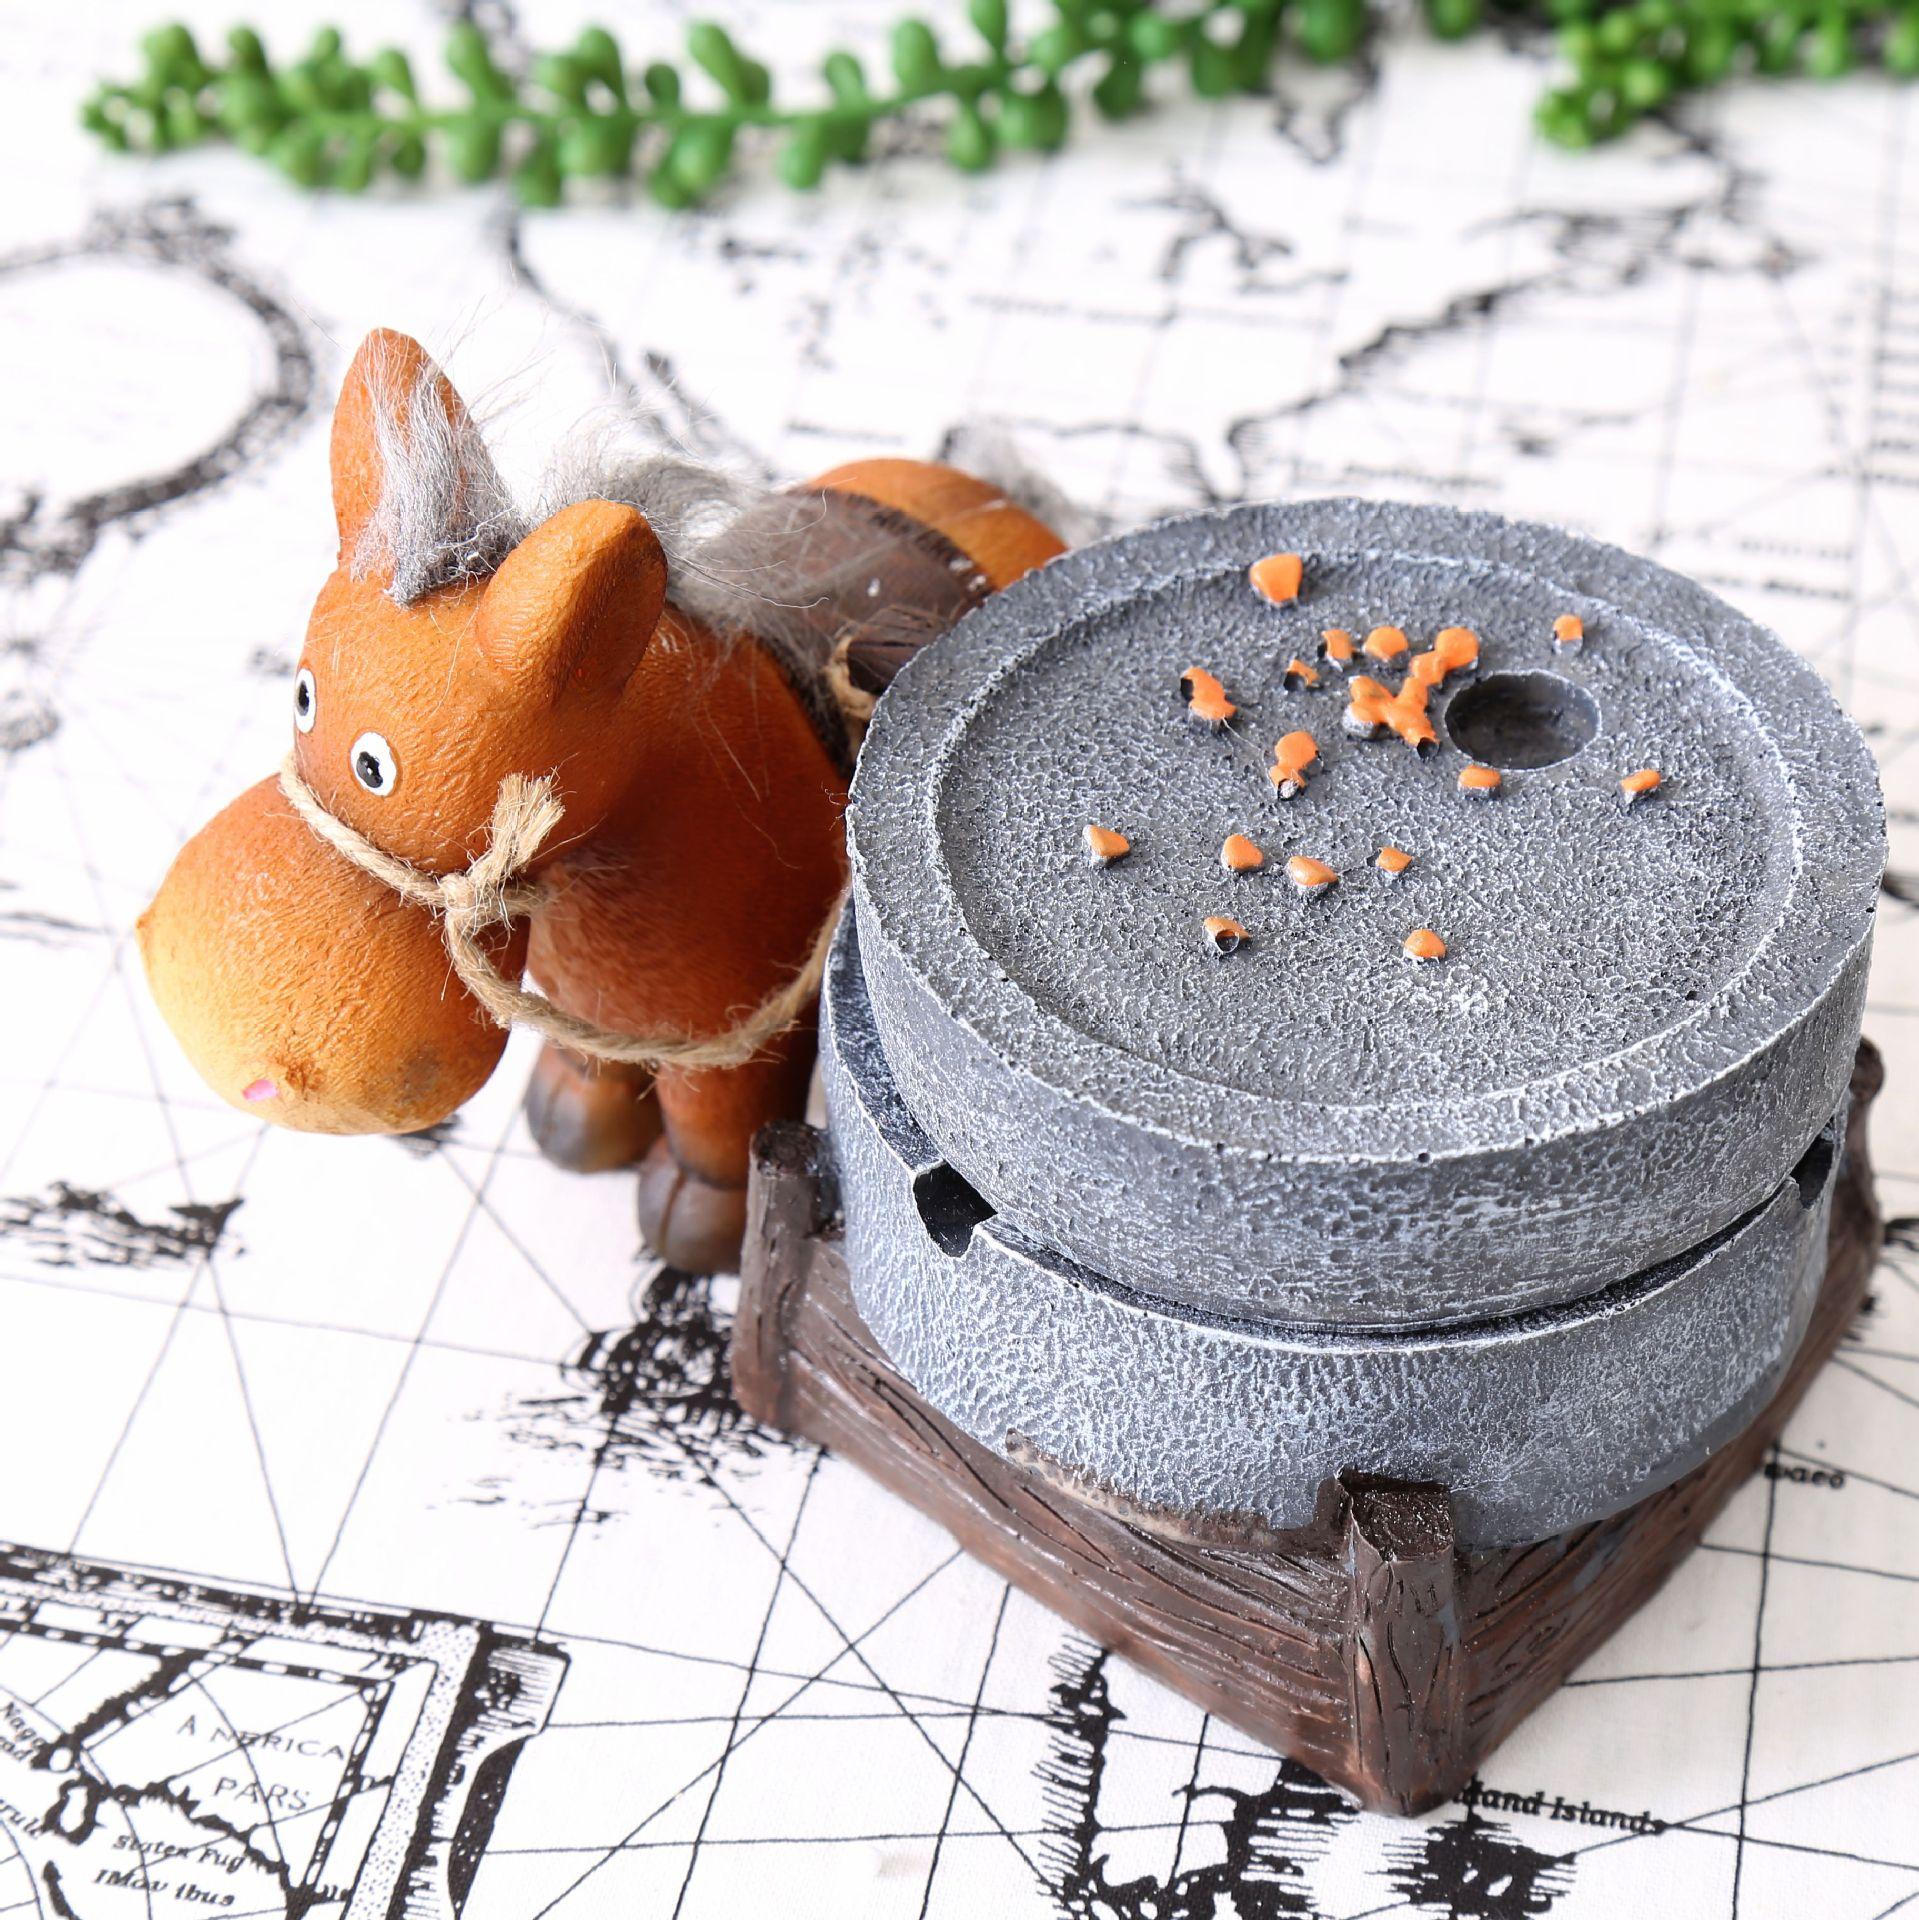 Donkey ornaments - Aliexpress Com Buy Staygold Donkey Ashtray Chinese Characteristics Gift Personalized Gift Resin Ornaments Cigar Ashtray Cendrier Cinzeiro Bonecos From